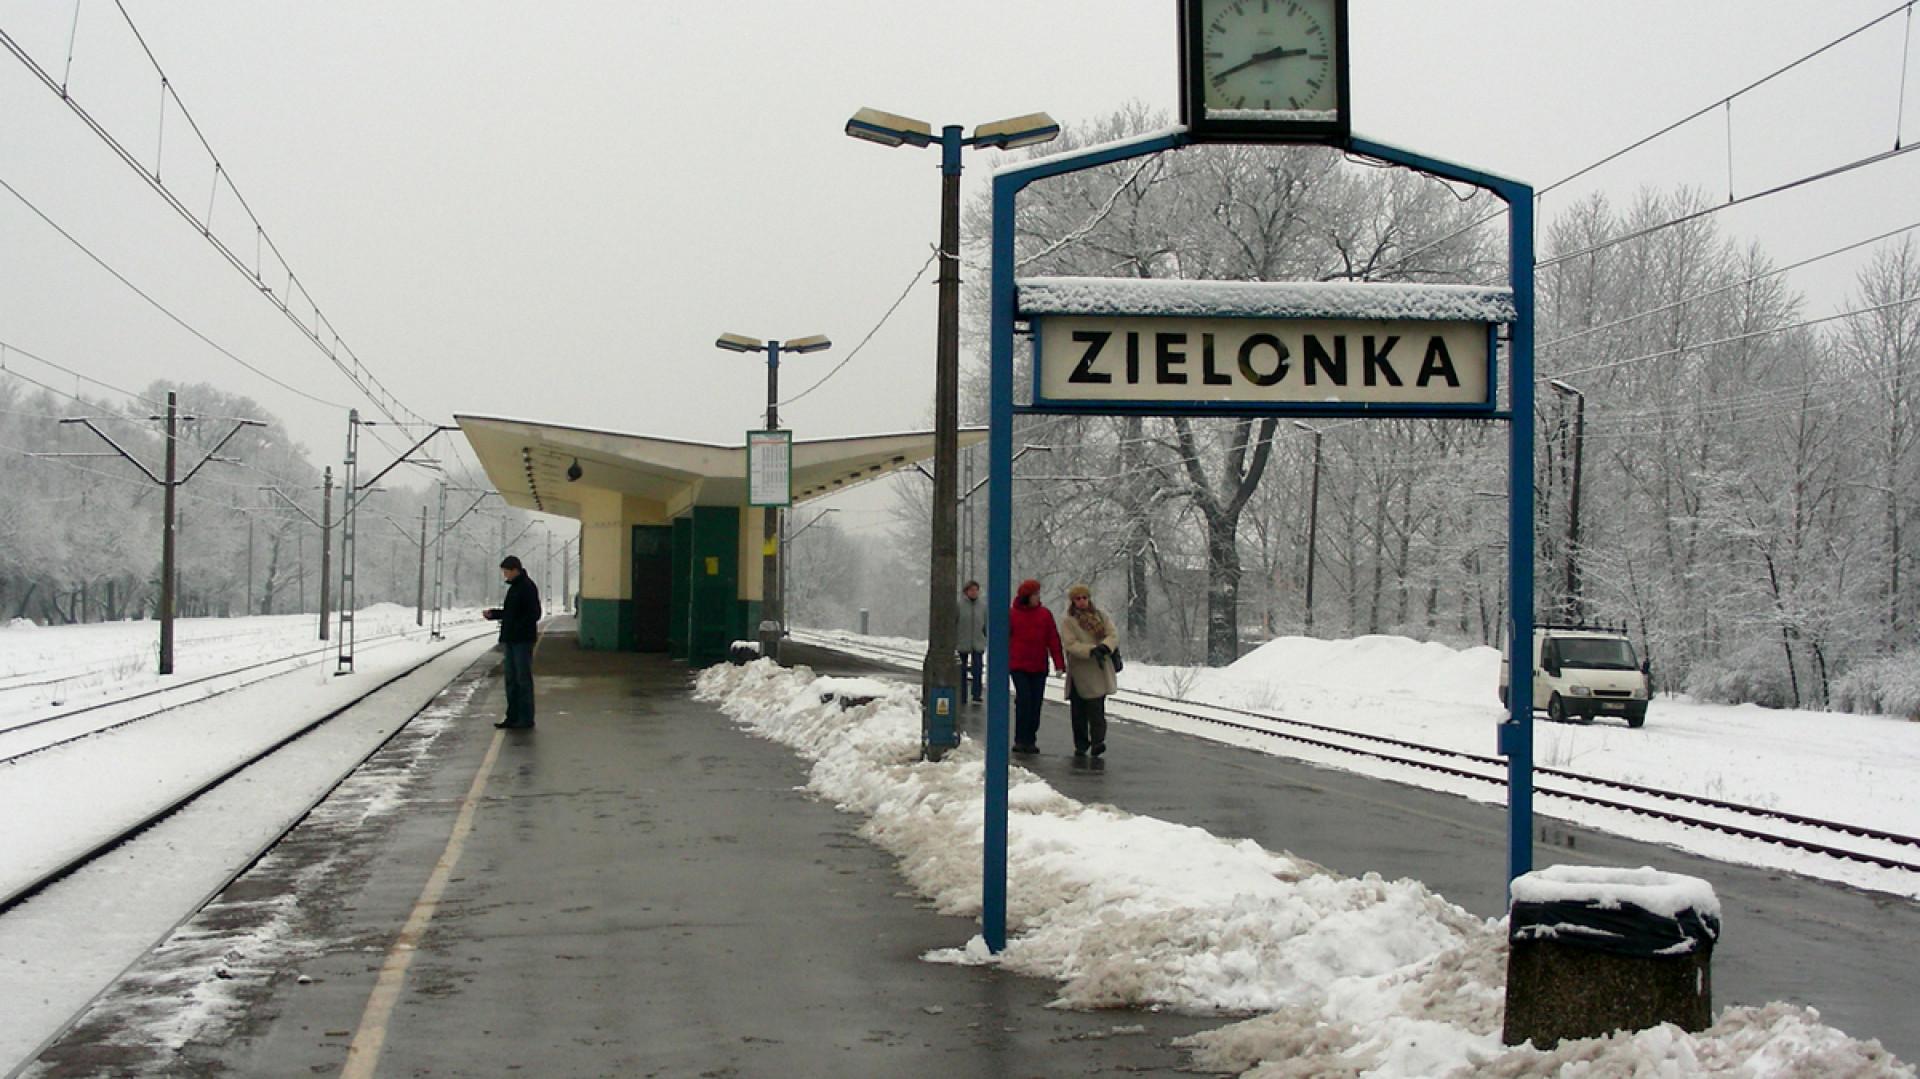 zielonka - Montaż alarmu Zielonka